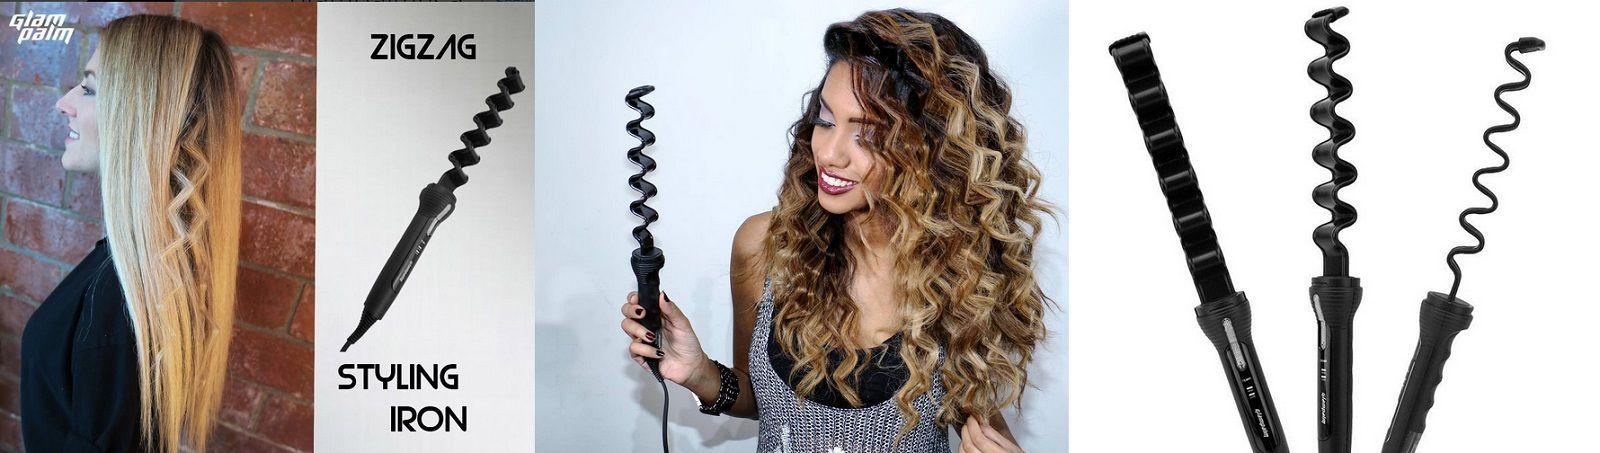 Hair trend: prenderà piede lo stile zig zag?